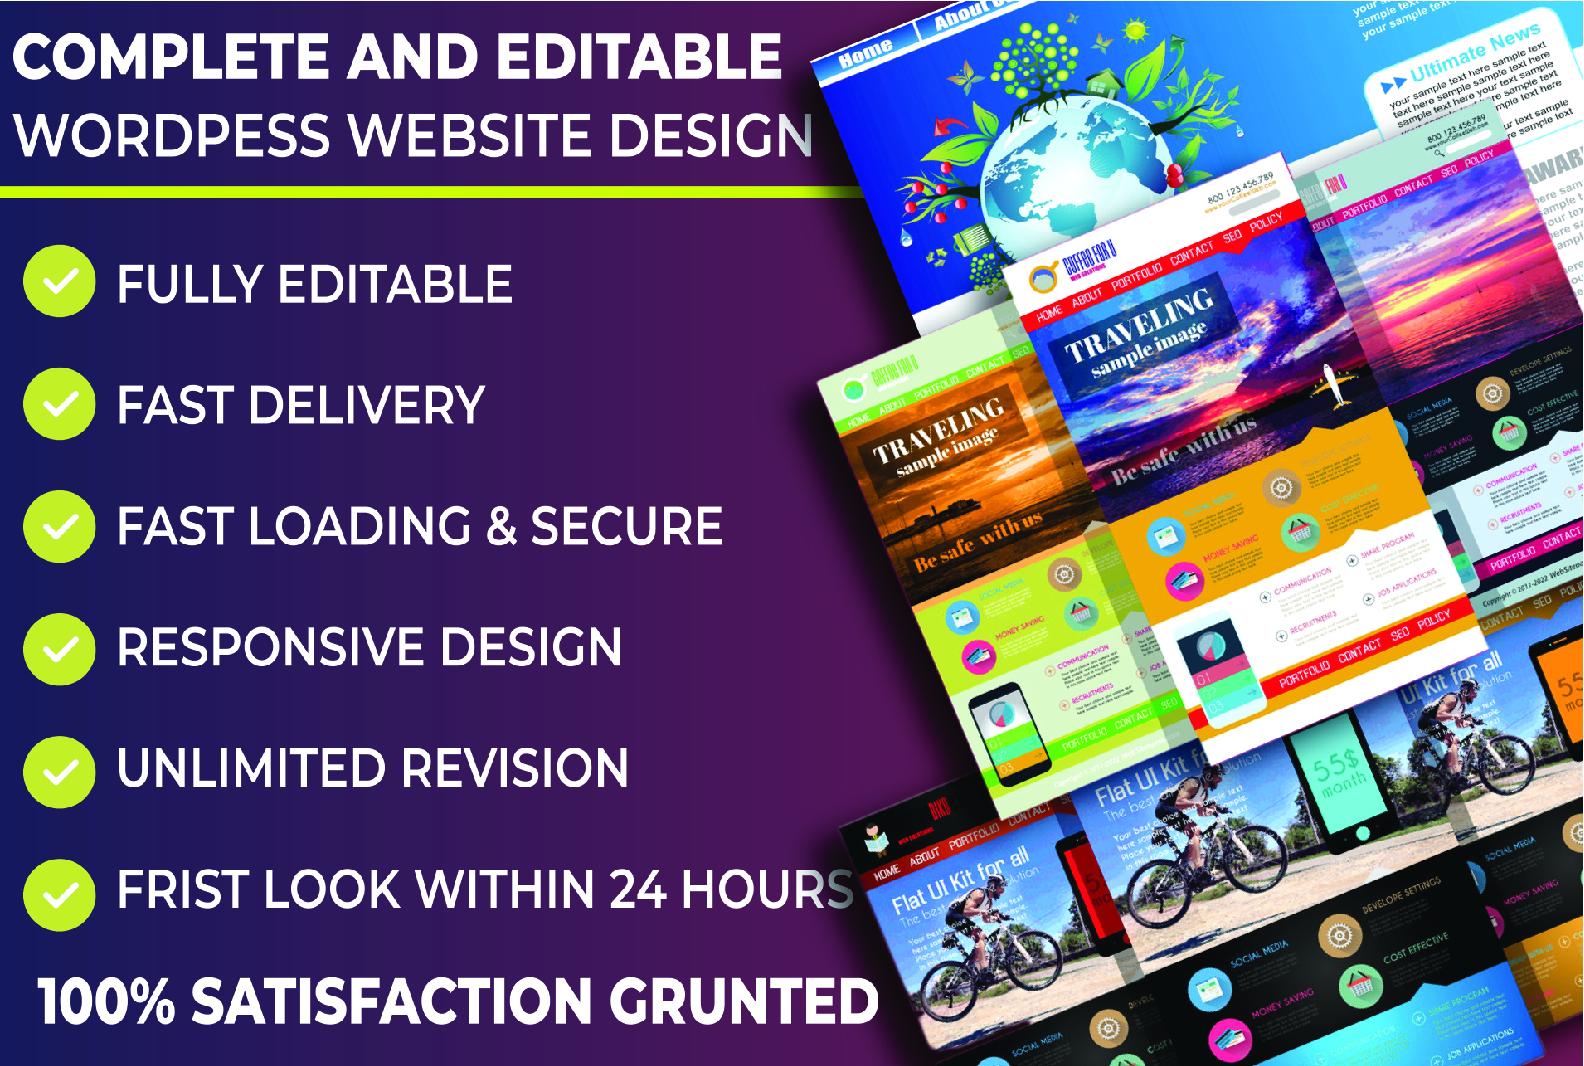 Design completed WordPress website customized premium theme and plugin